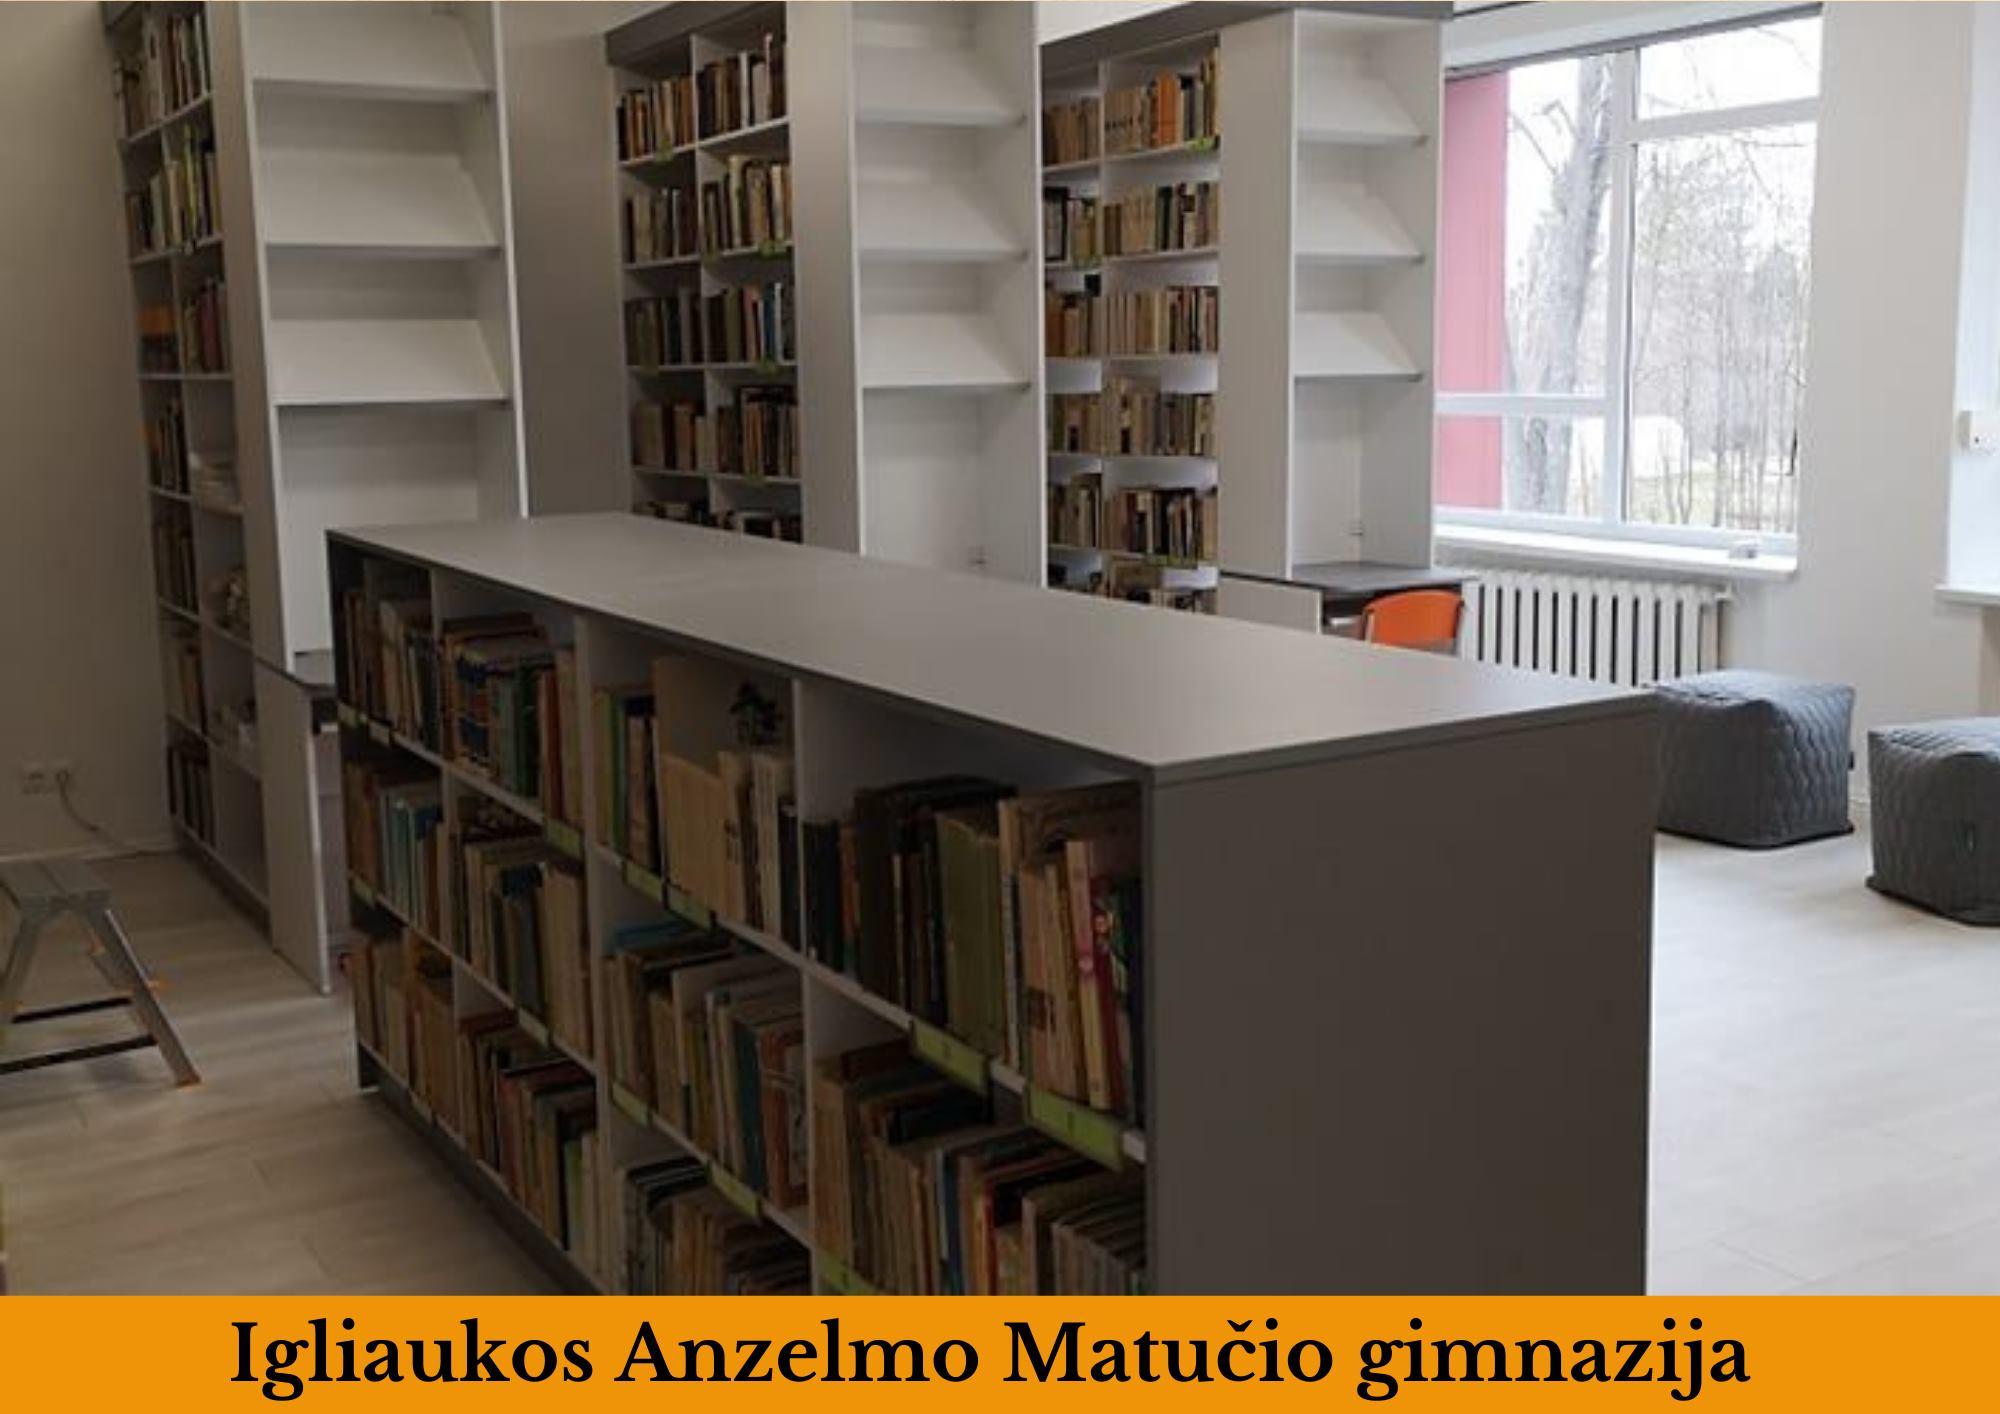 Igliaukos Anzelmo Matučio gimnazija